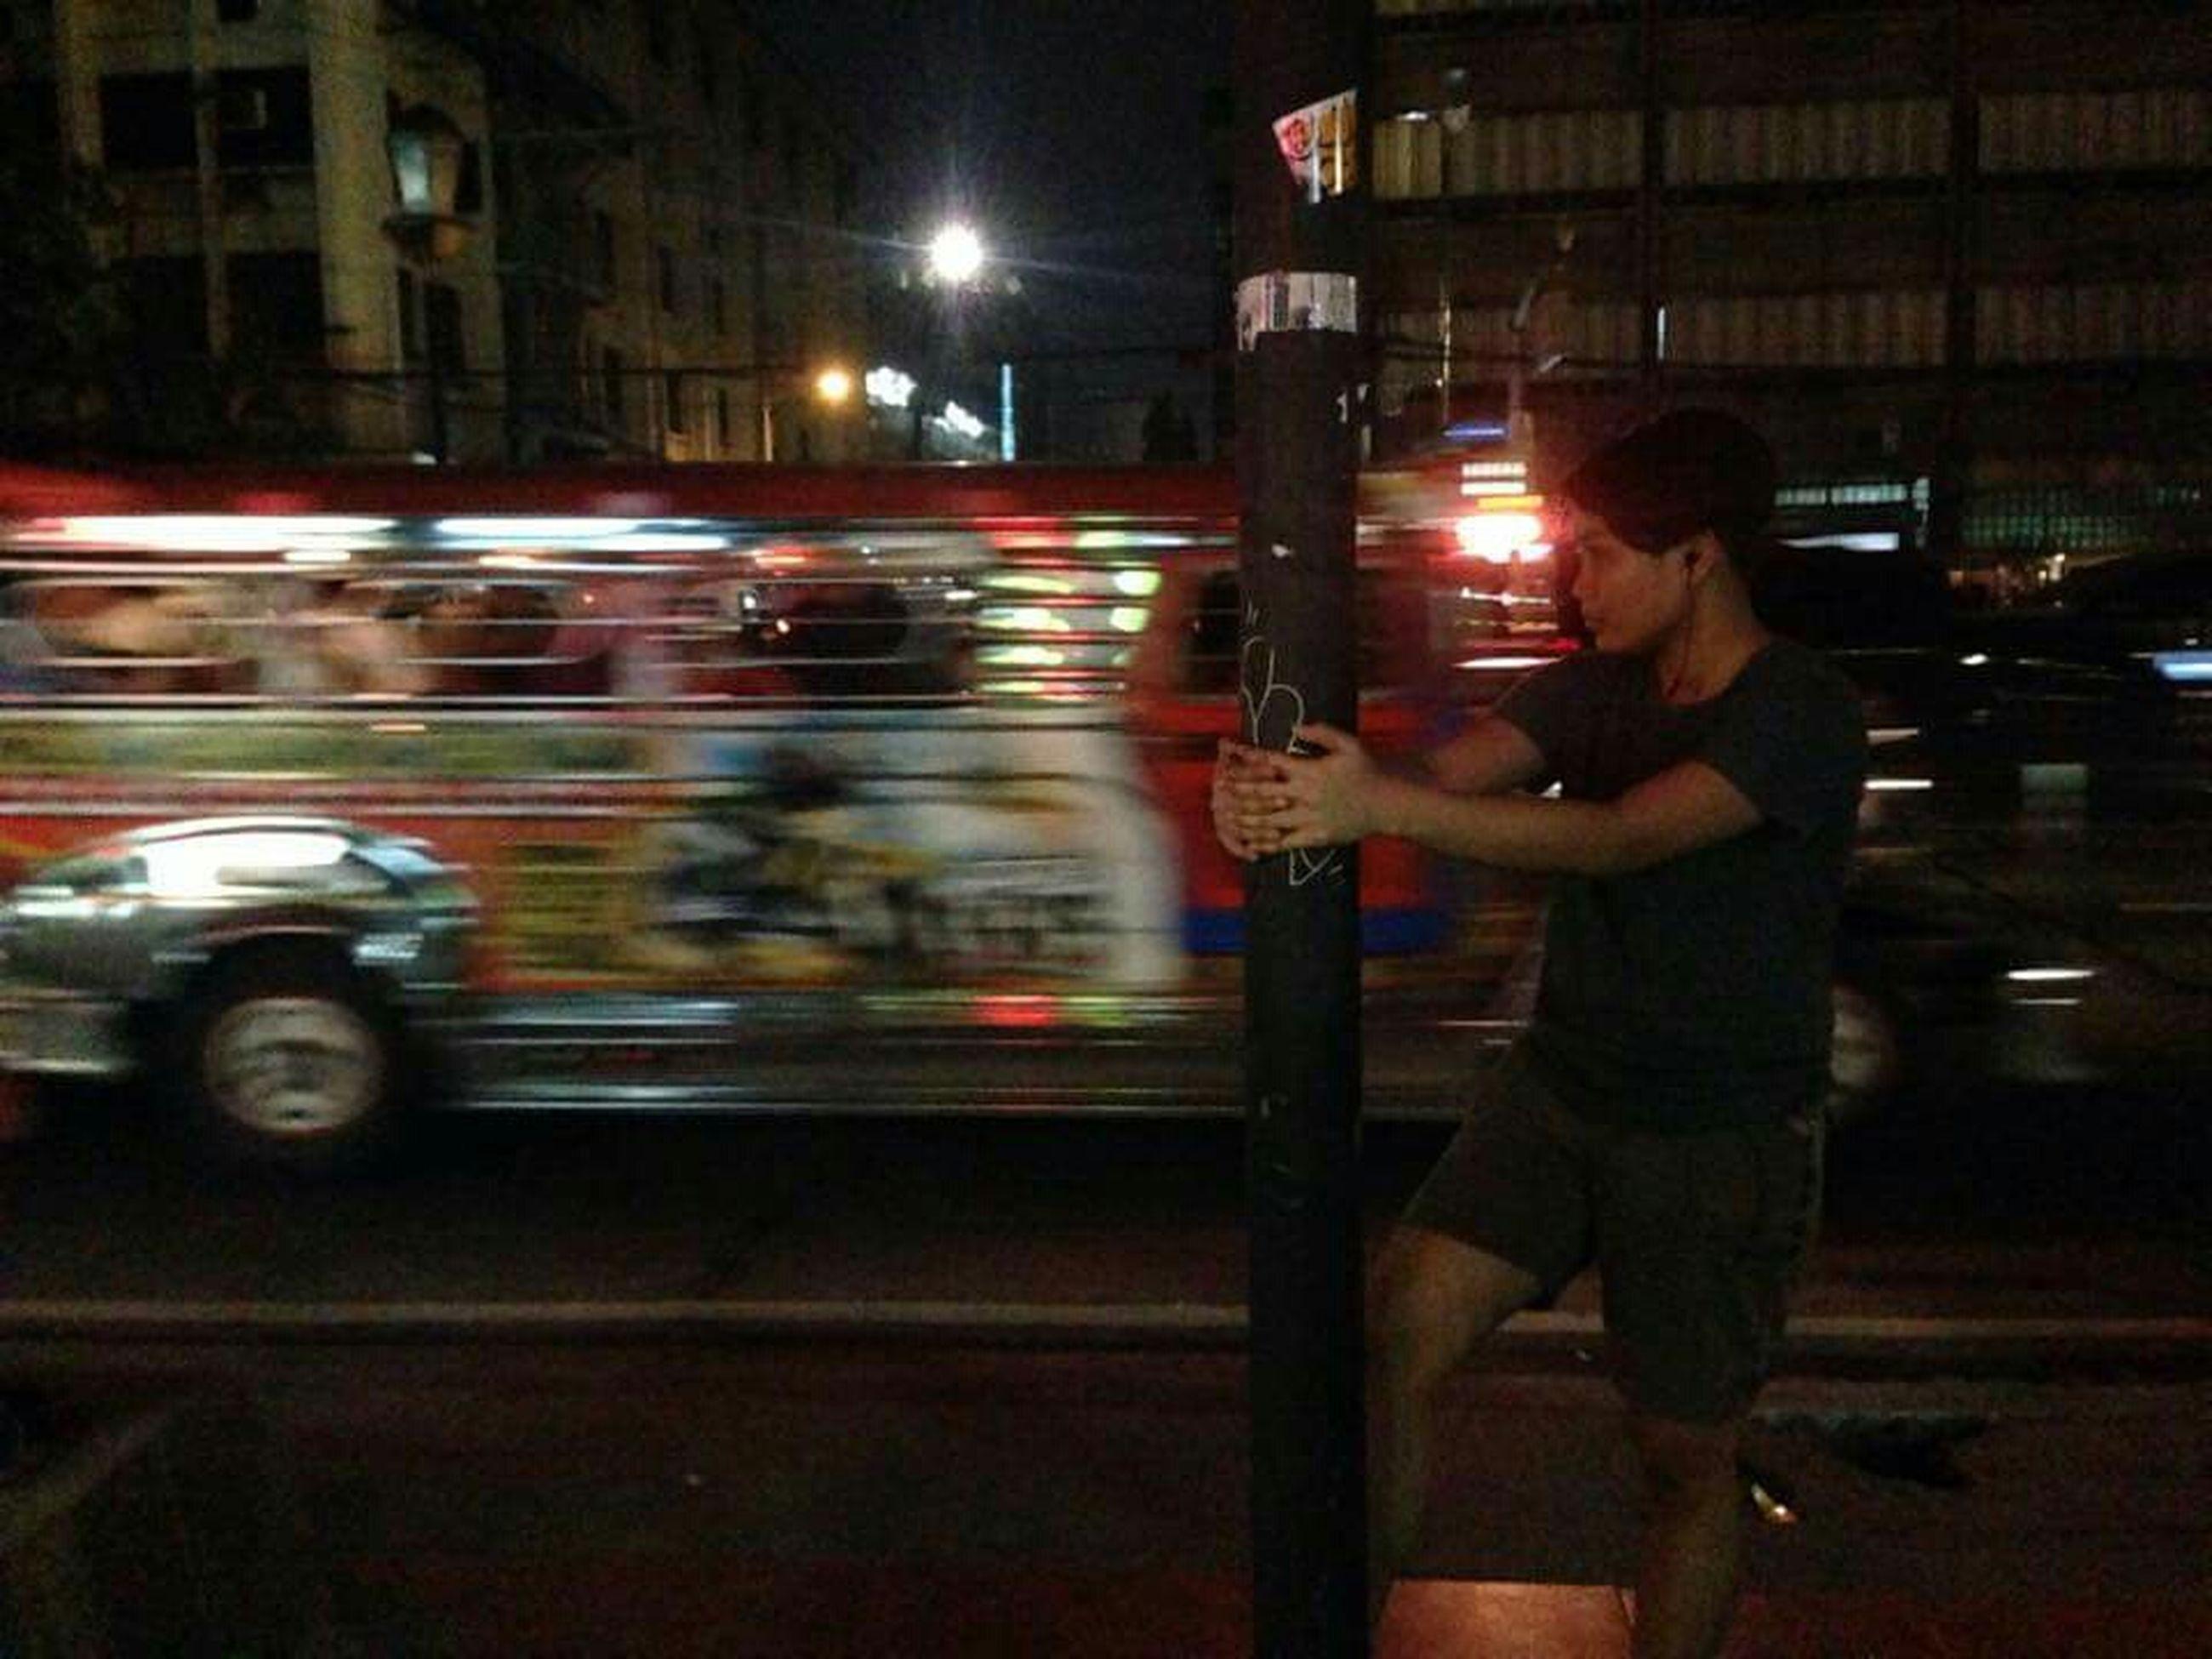 transportation, mode of transport, land vehicle, night, illuminated, street, car, motion, blurred motion, on the move, city, city life, road, speed, travel, city street, men, lifestyles